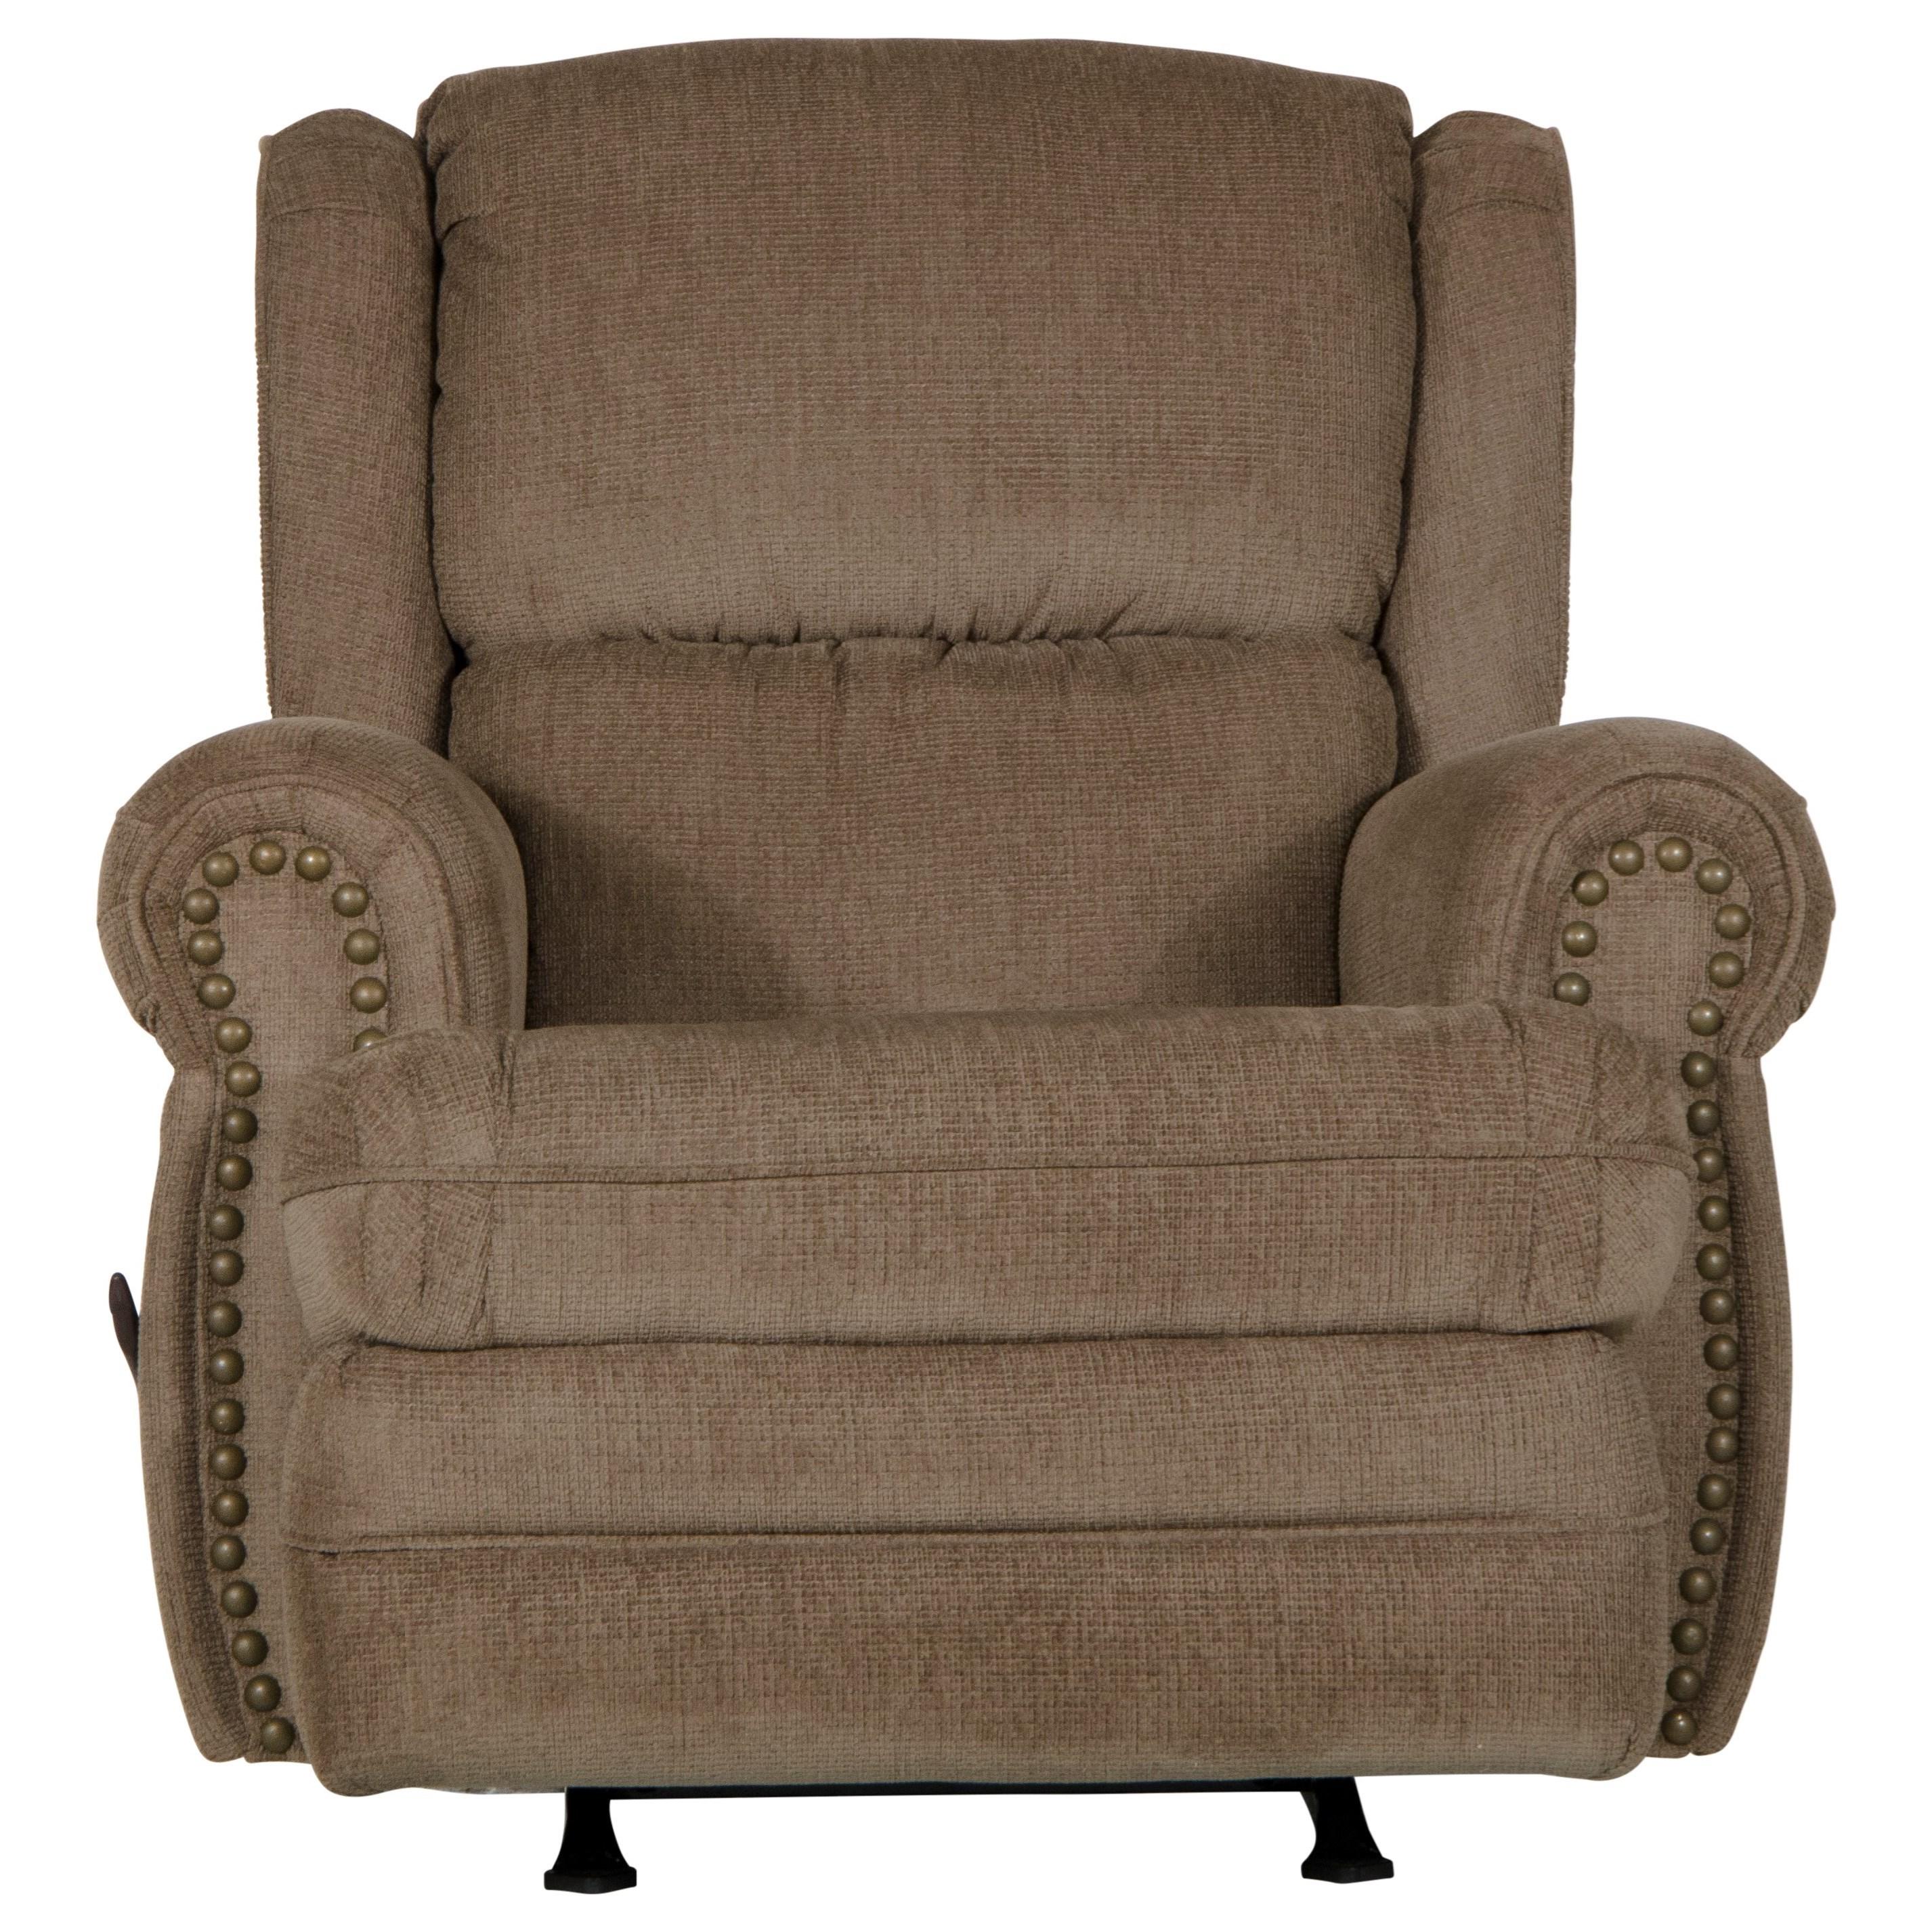 Singletary Rocker Recliner by Jackson Furniture at Zak's Home